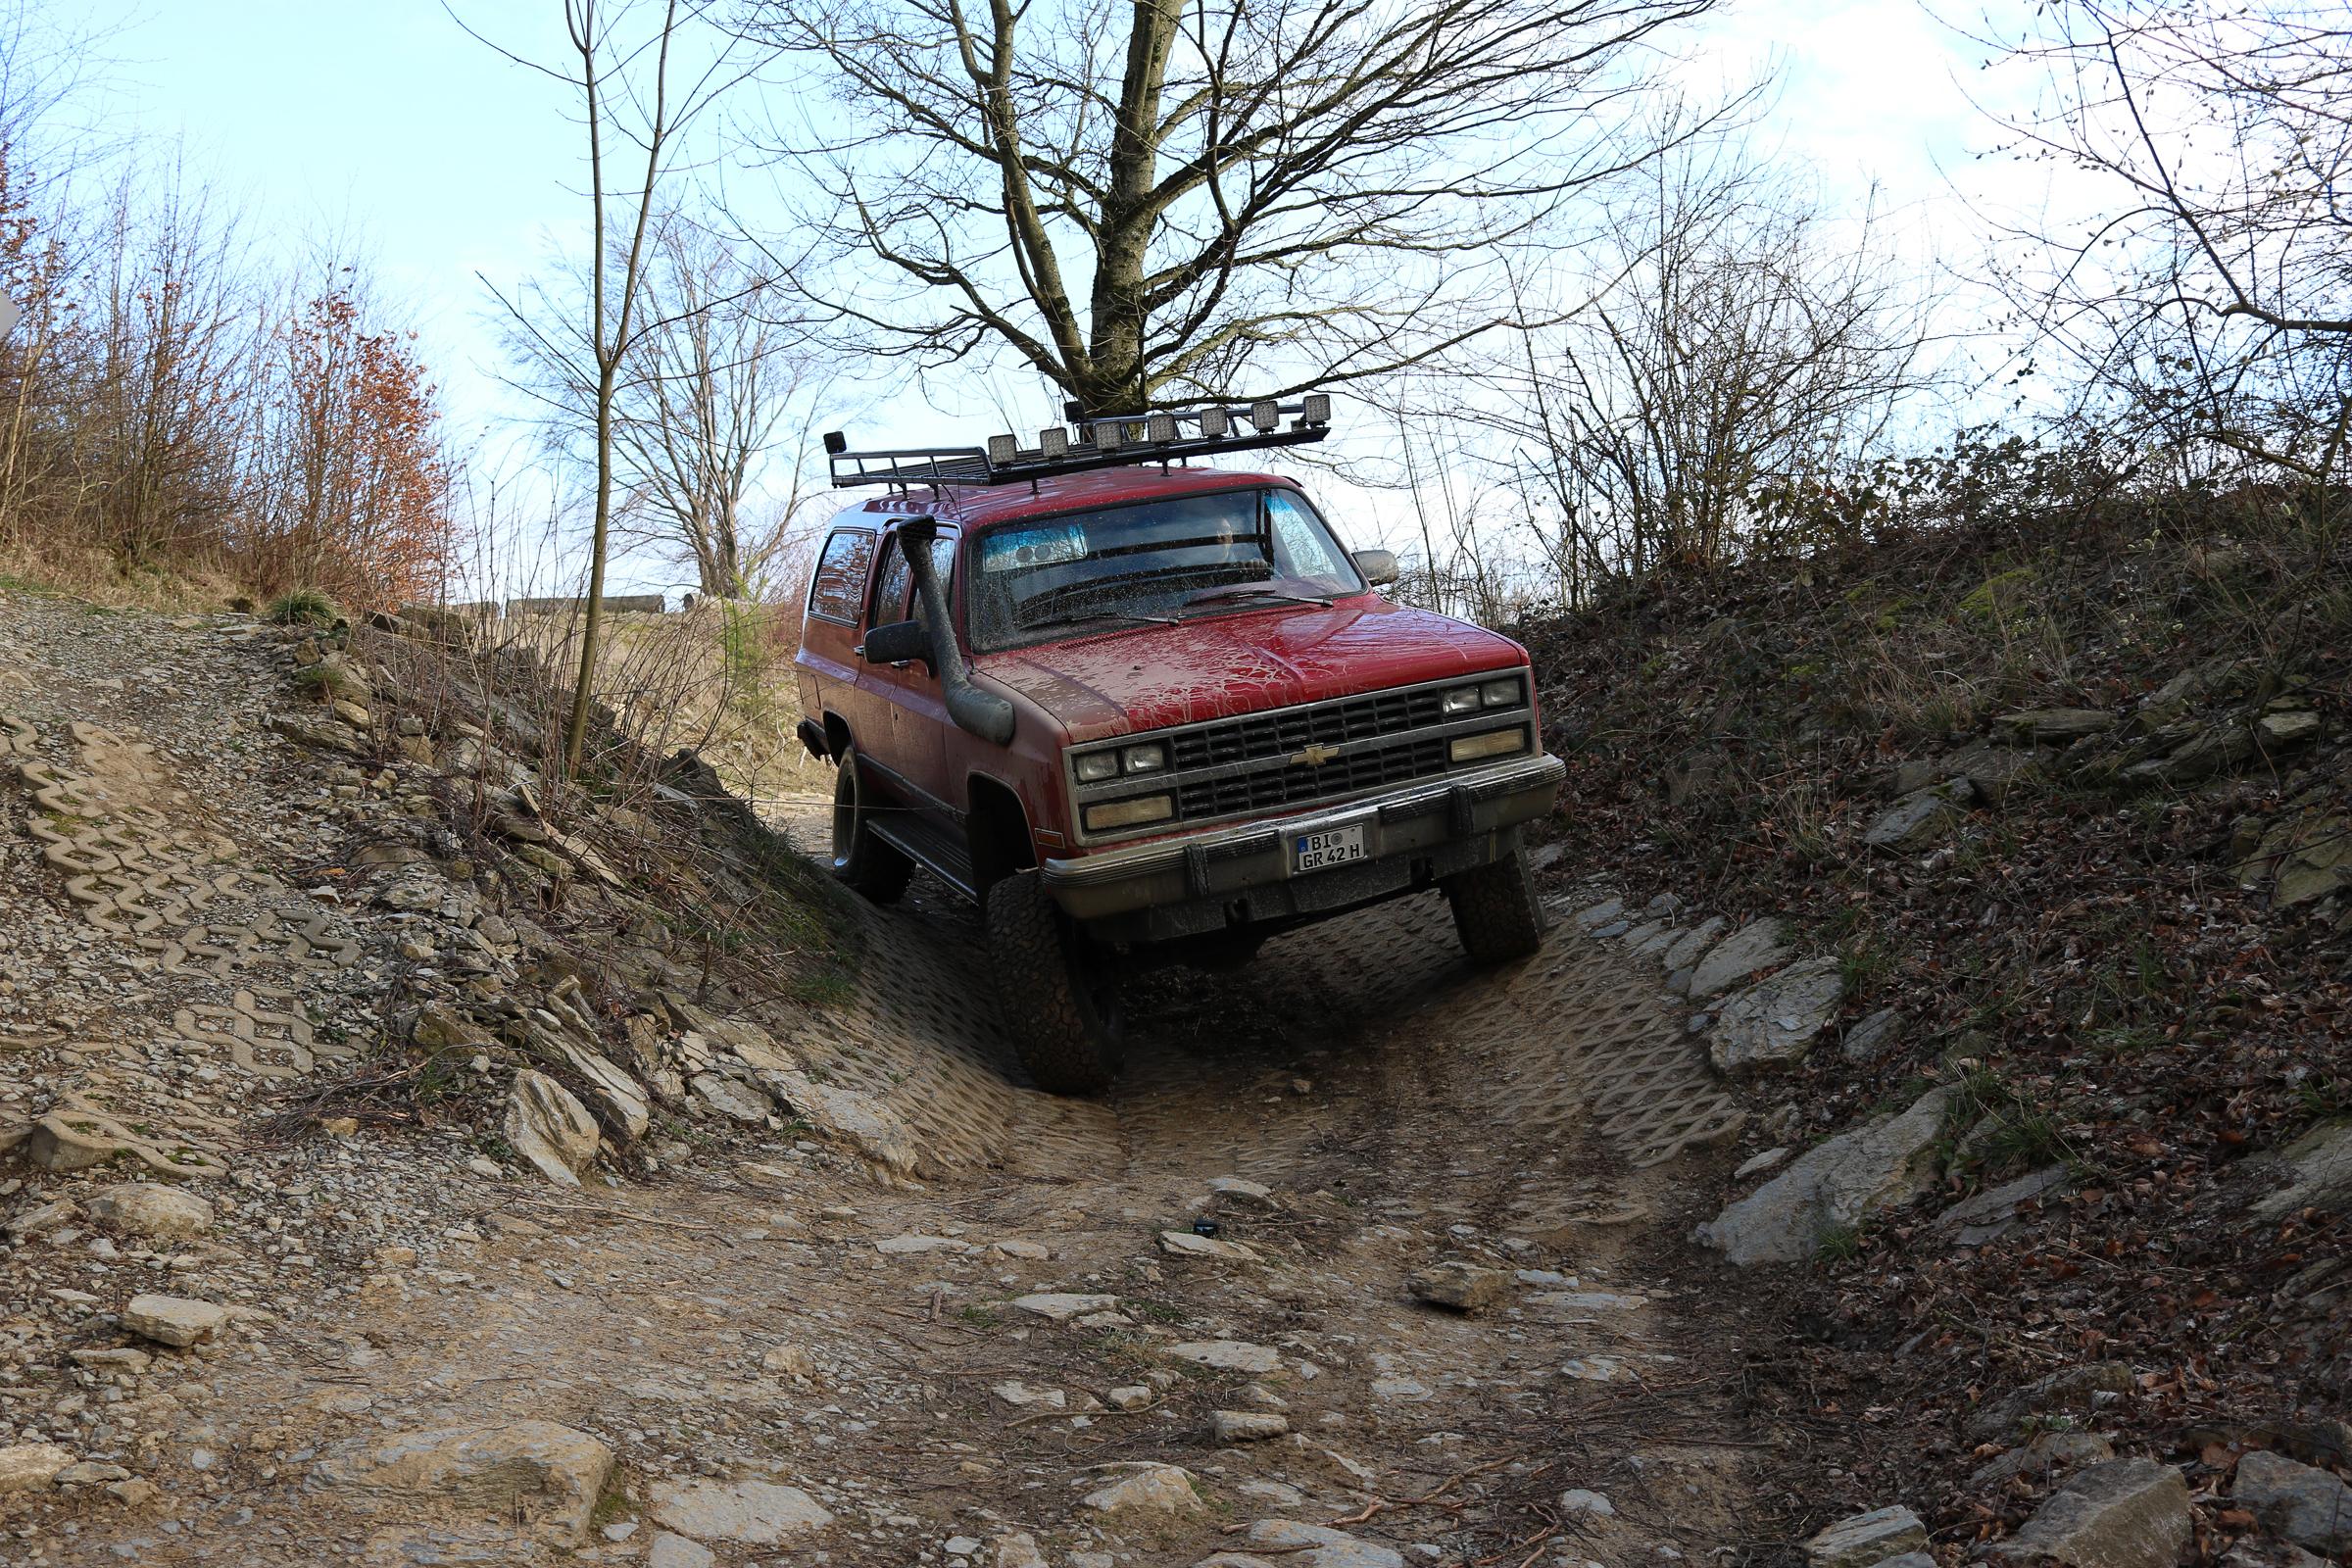 Dejlig BIGR42 goes Offroad - Der Offroad Parcour vom Bilster Berg! | rad QD-04